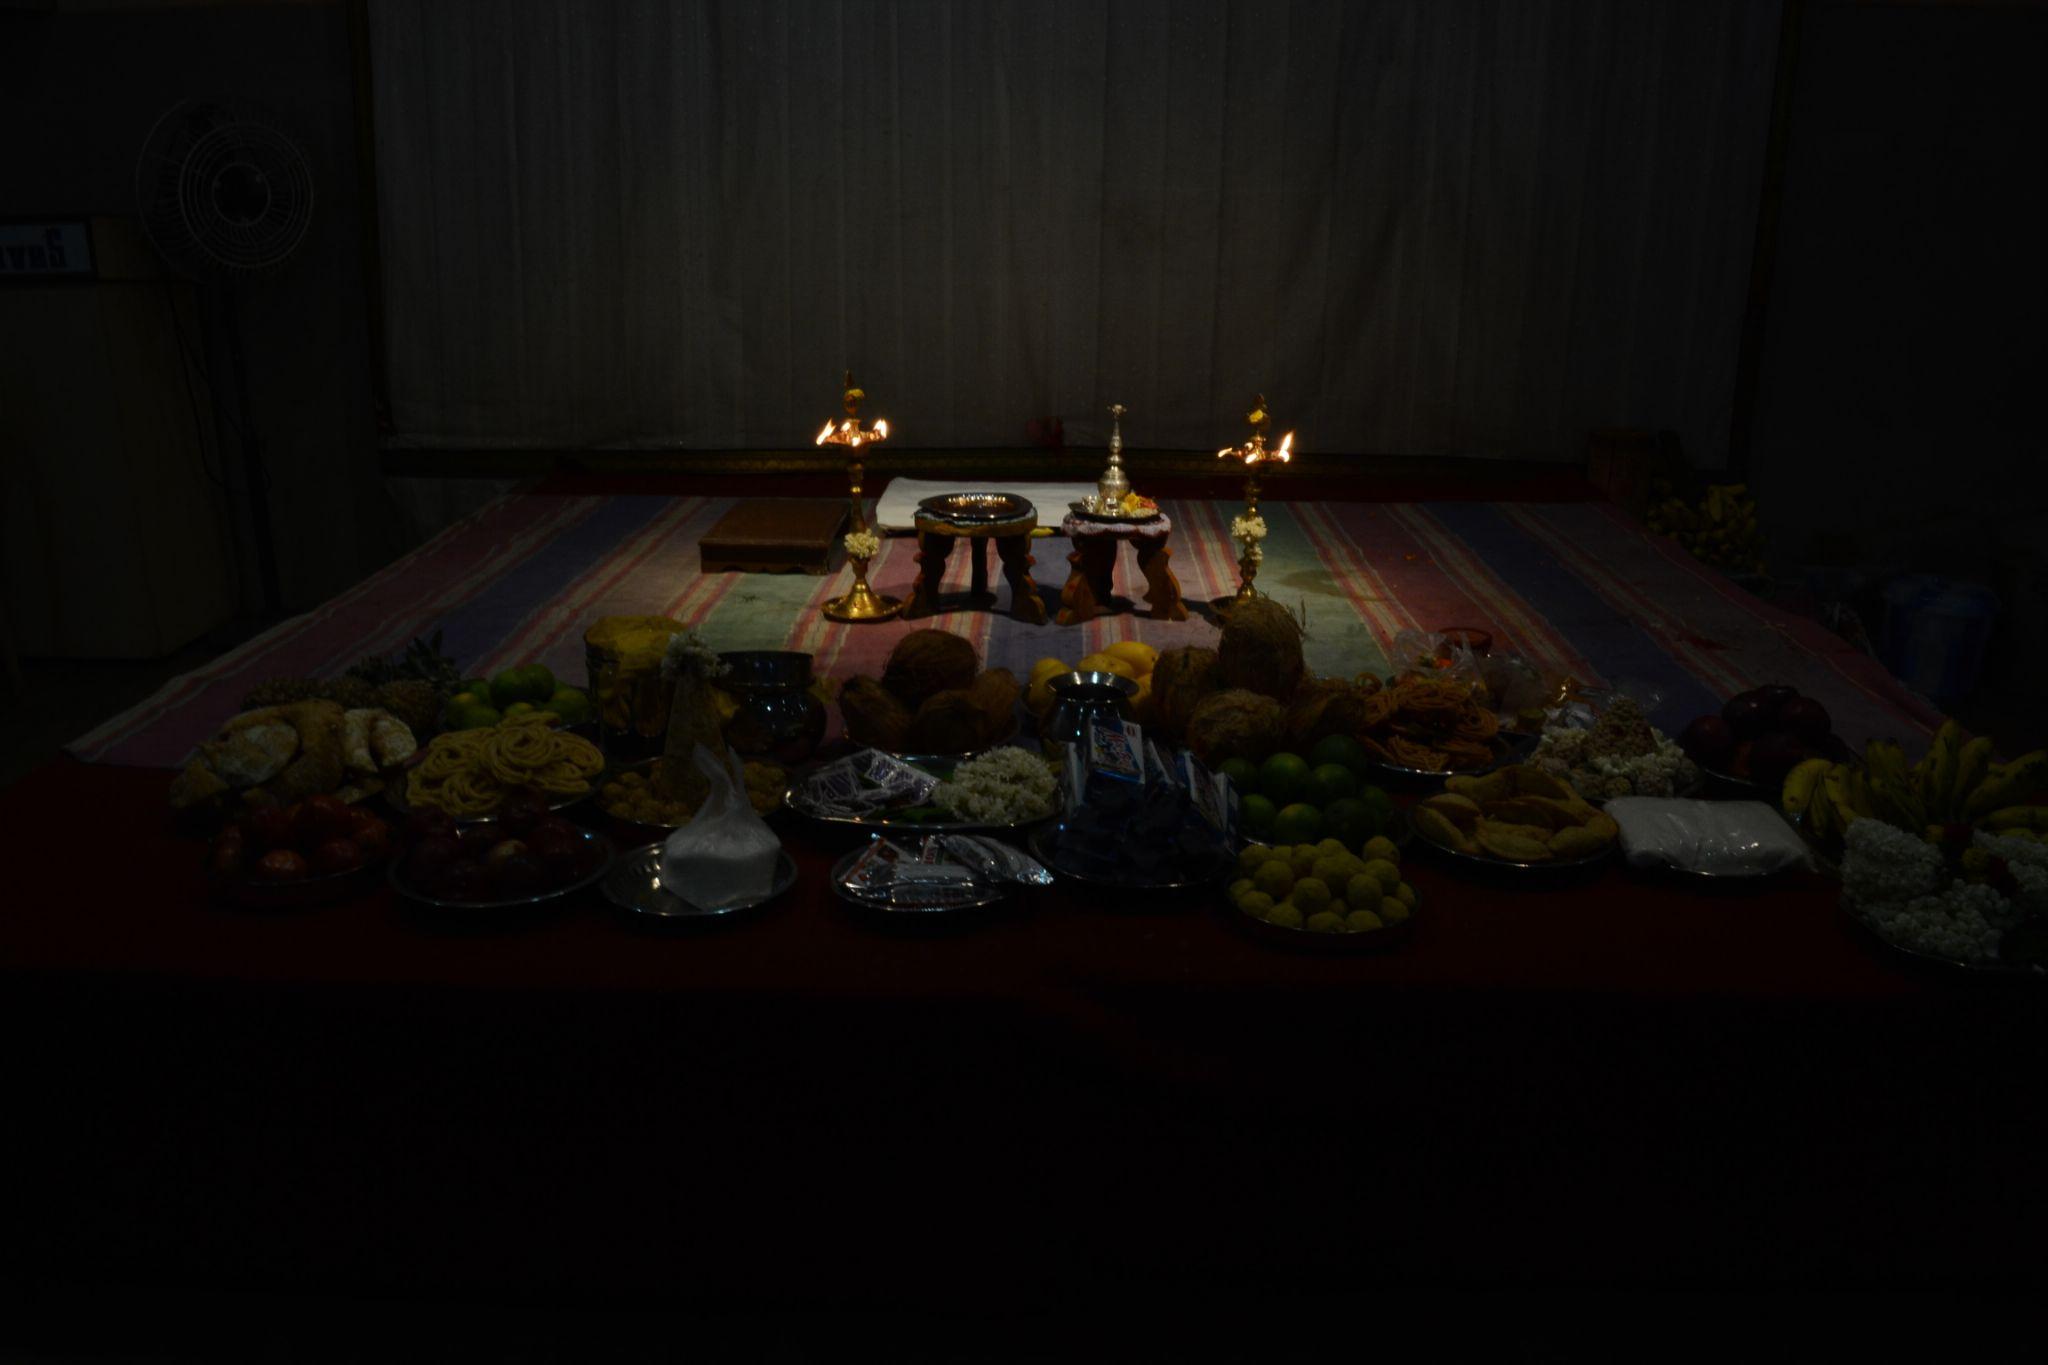 Indian engagement stage by Yuvaraj Karthik